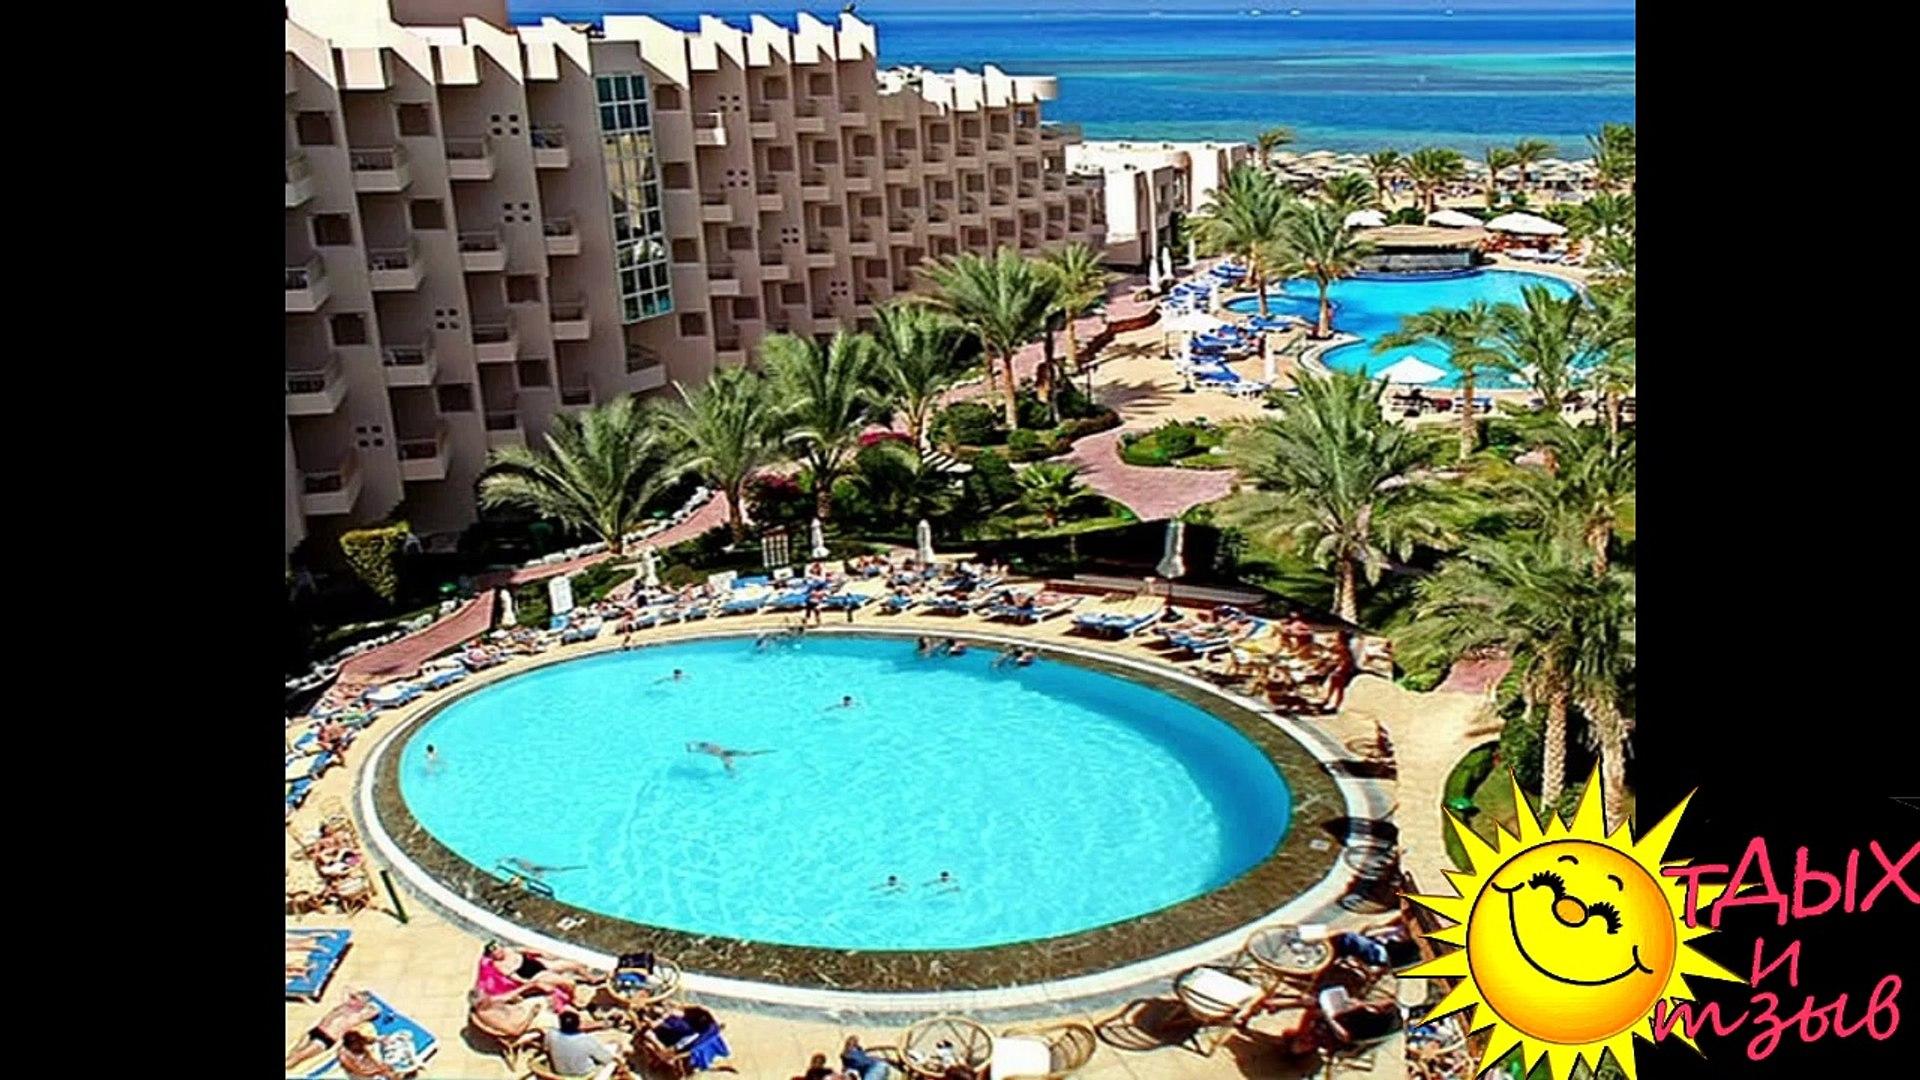 Отзывы отдыхающих об отеле Sea Star Beau Rivage 5* г.Хургада (ЕГИПЕТ)